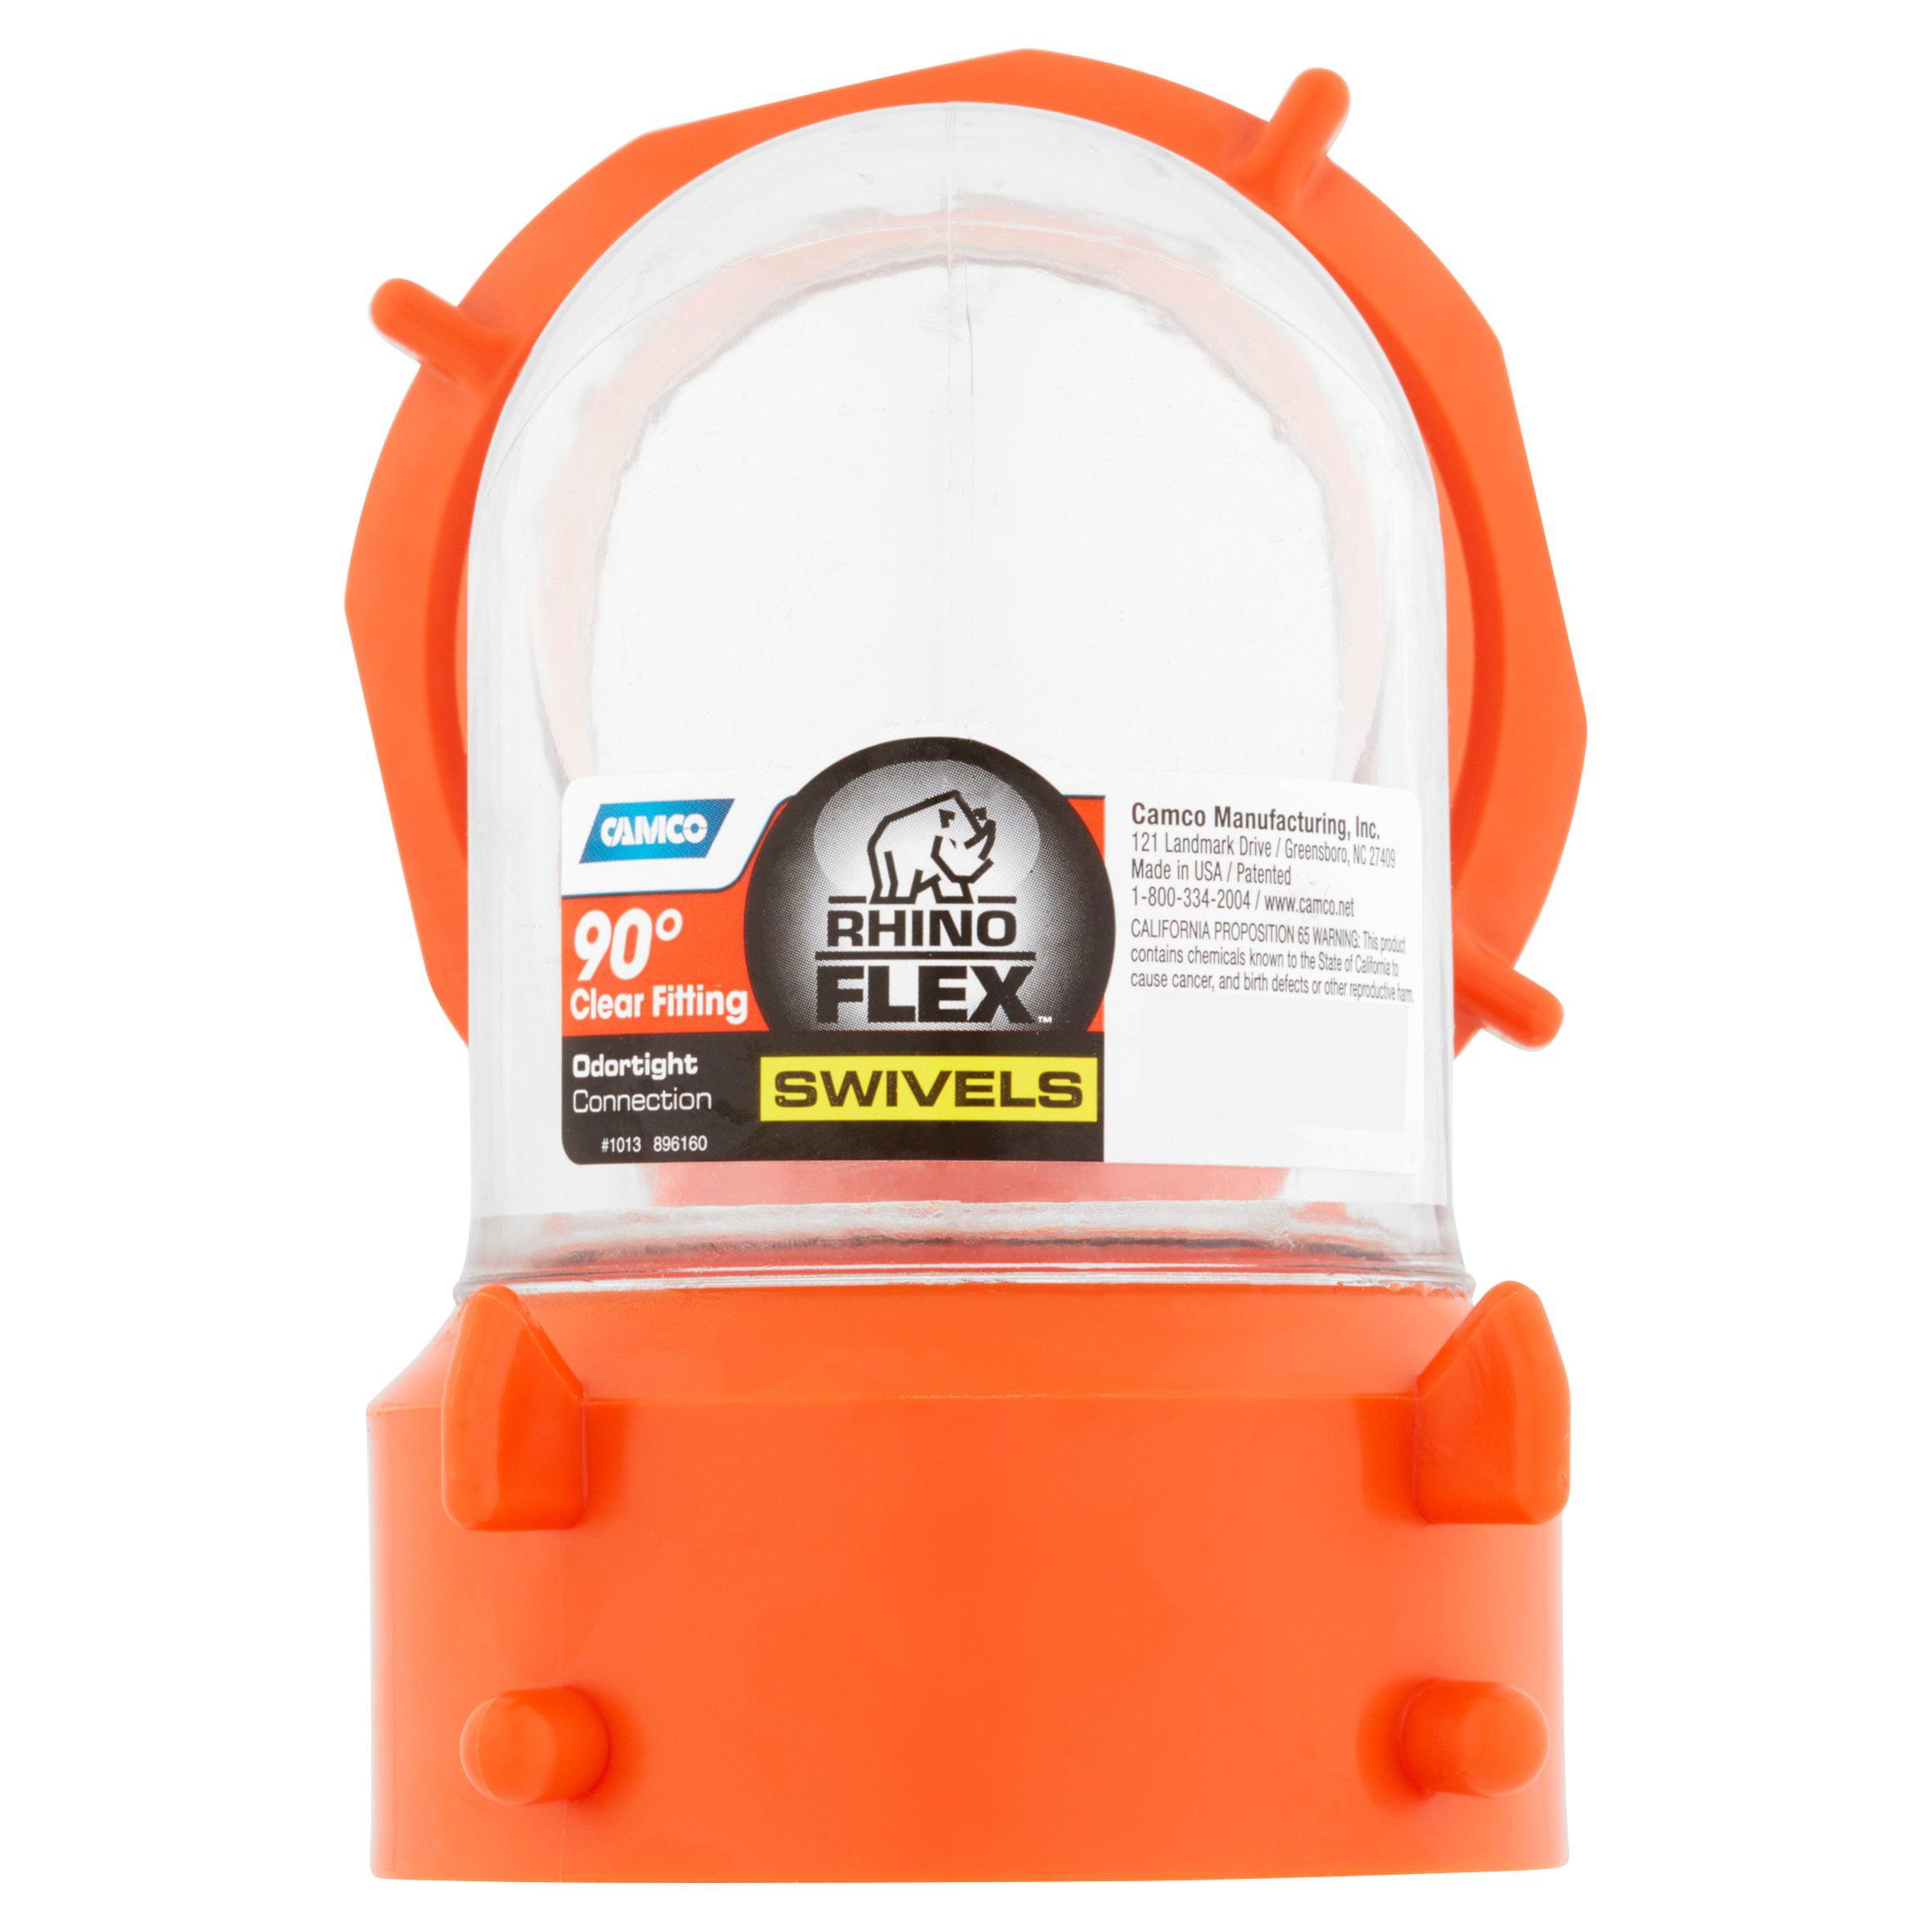 Camco Rhinoflex Swivels 90 Deg Clear Fitting Odortight Connection Walmart Com Walmart Com